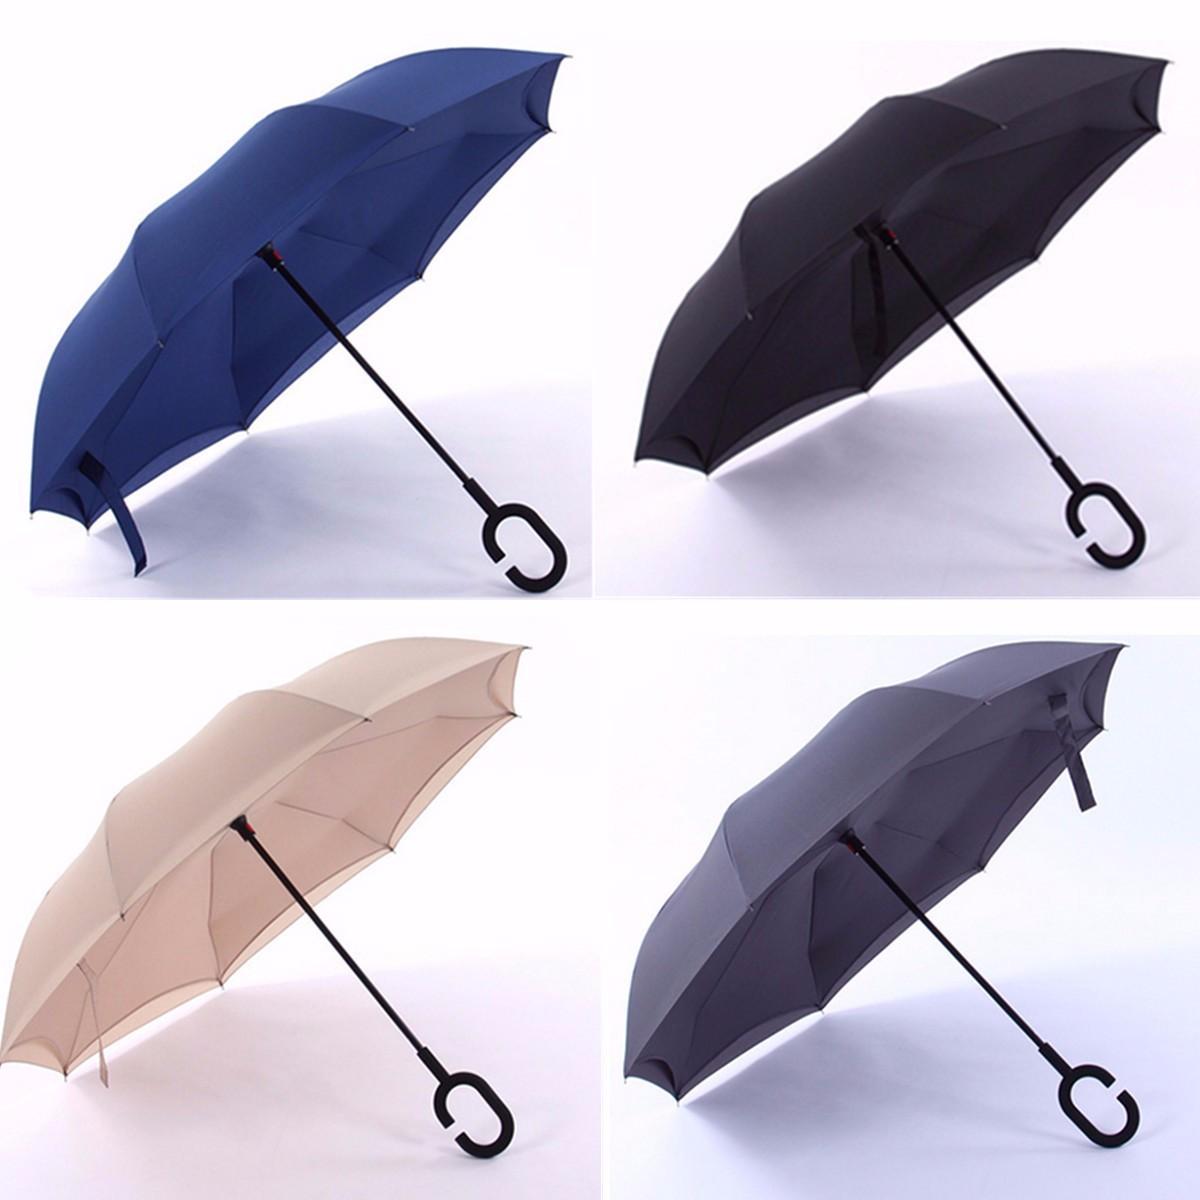 C Shape Handle Reverse Inverted Umbrella Double Layer Inside Out Umbrella Rain Sun Proof Parasol Bumbershoot Rain Gear(China (Mainland))